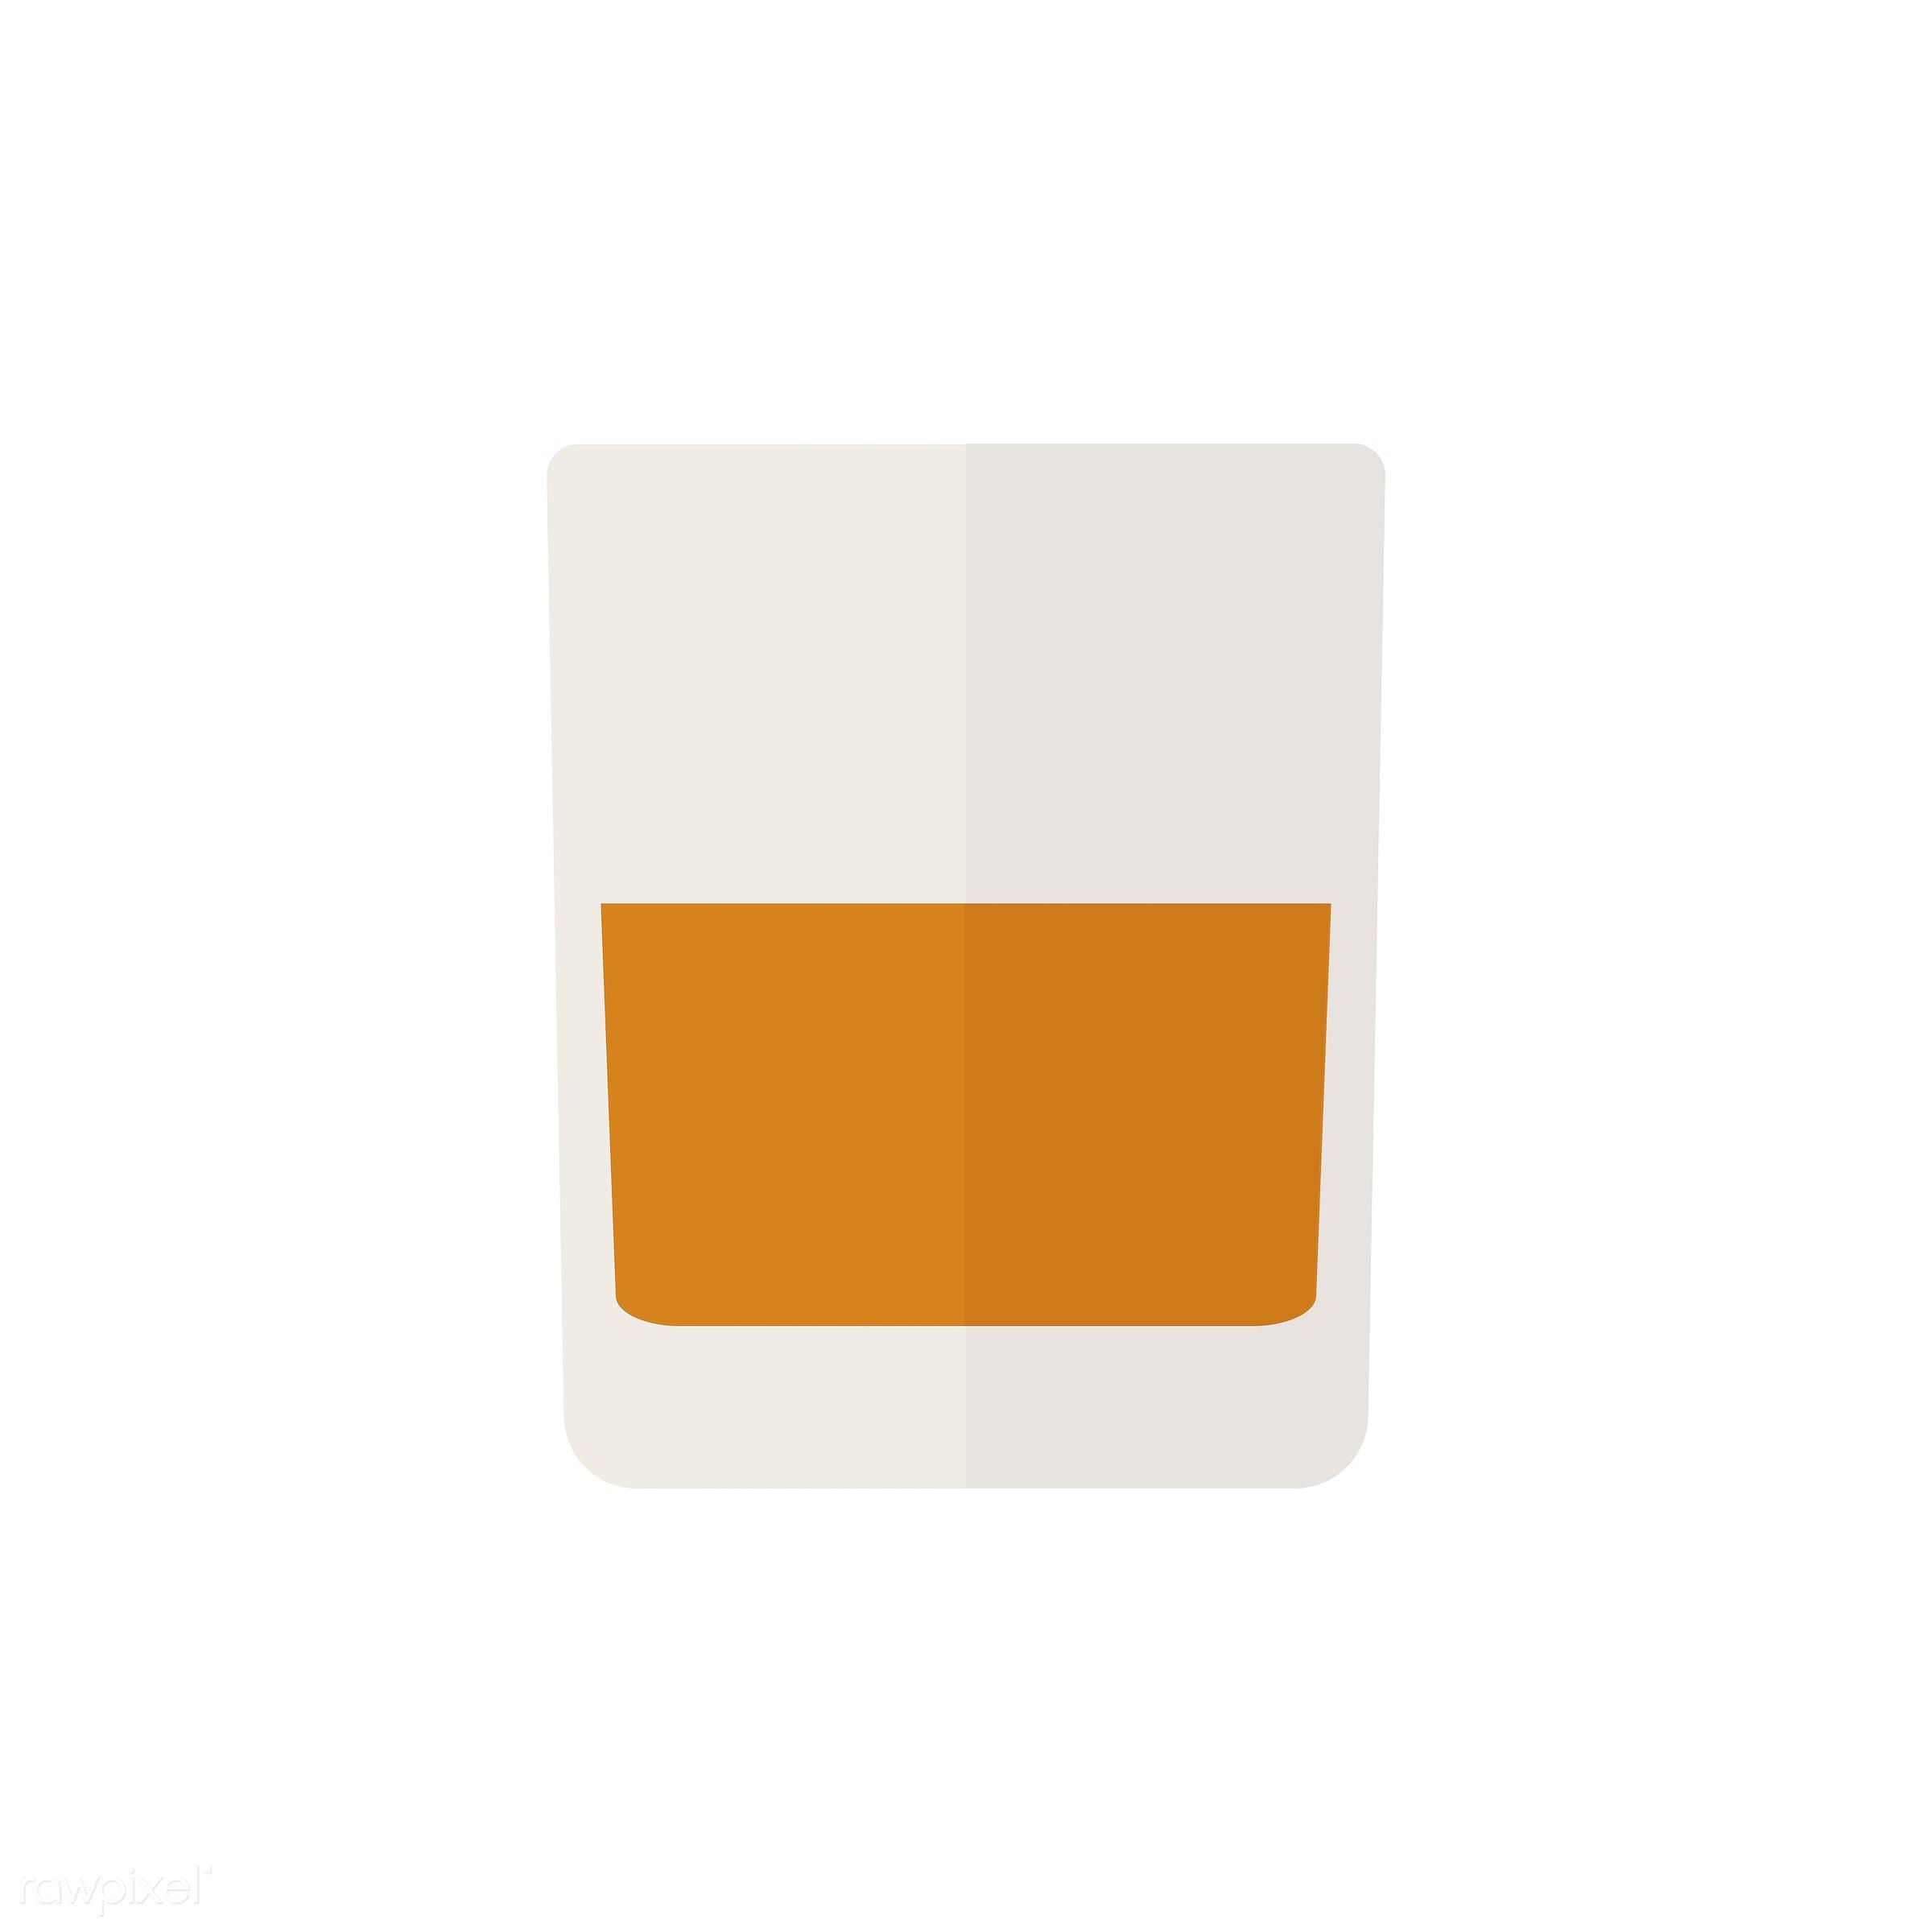 vector, graphic, illustration, icon, symbol, colorful, cute, drink, beverage, water, orange, whiskey, orange juice